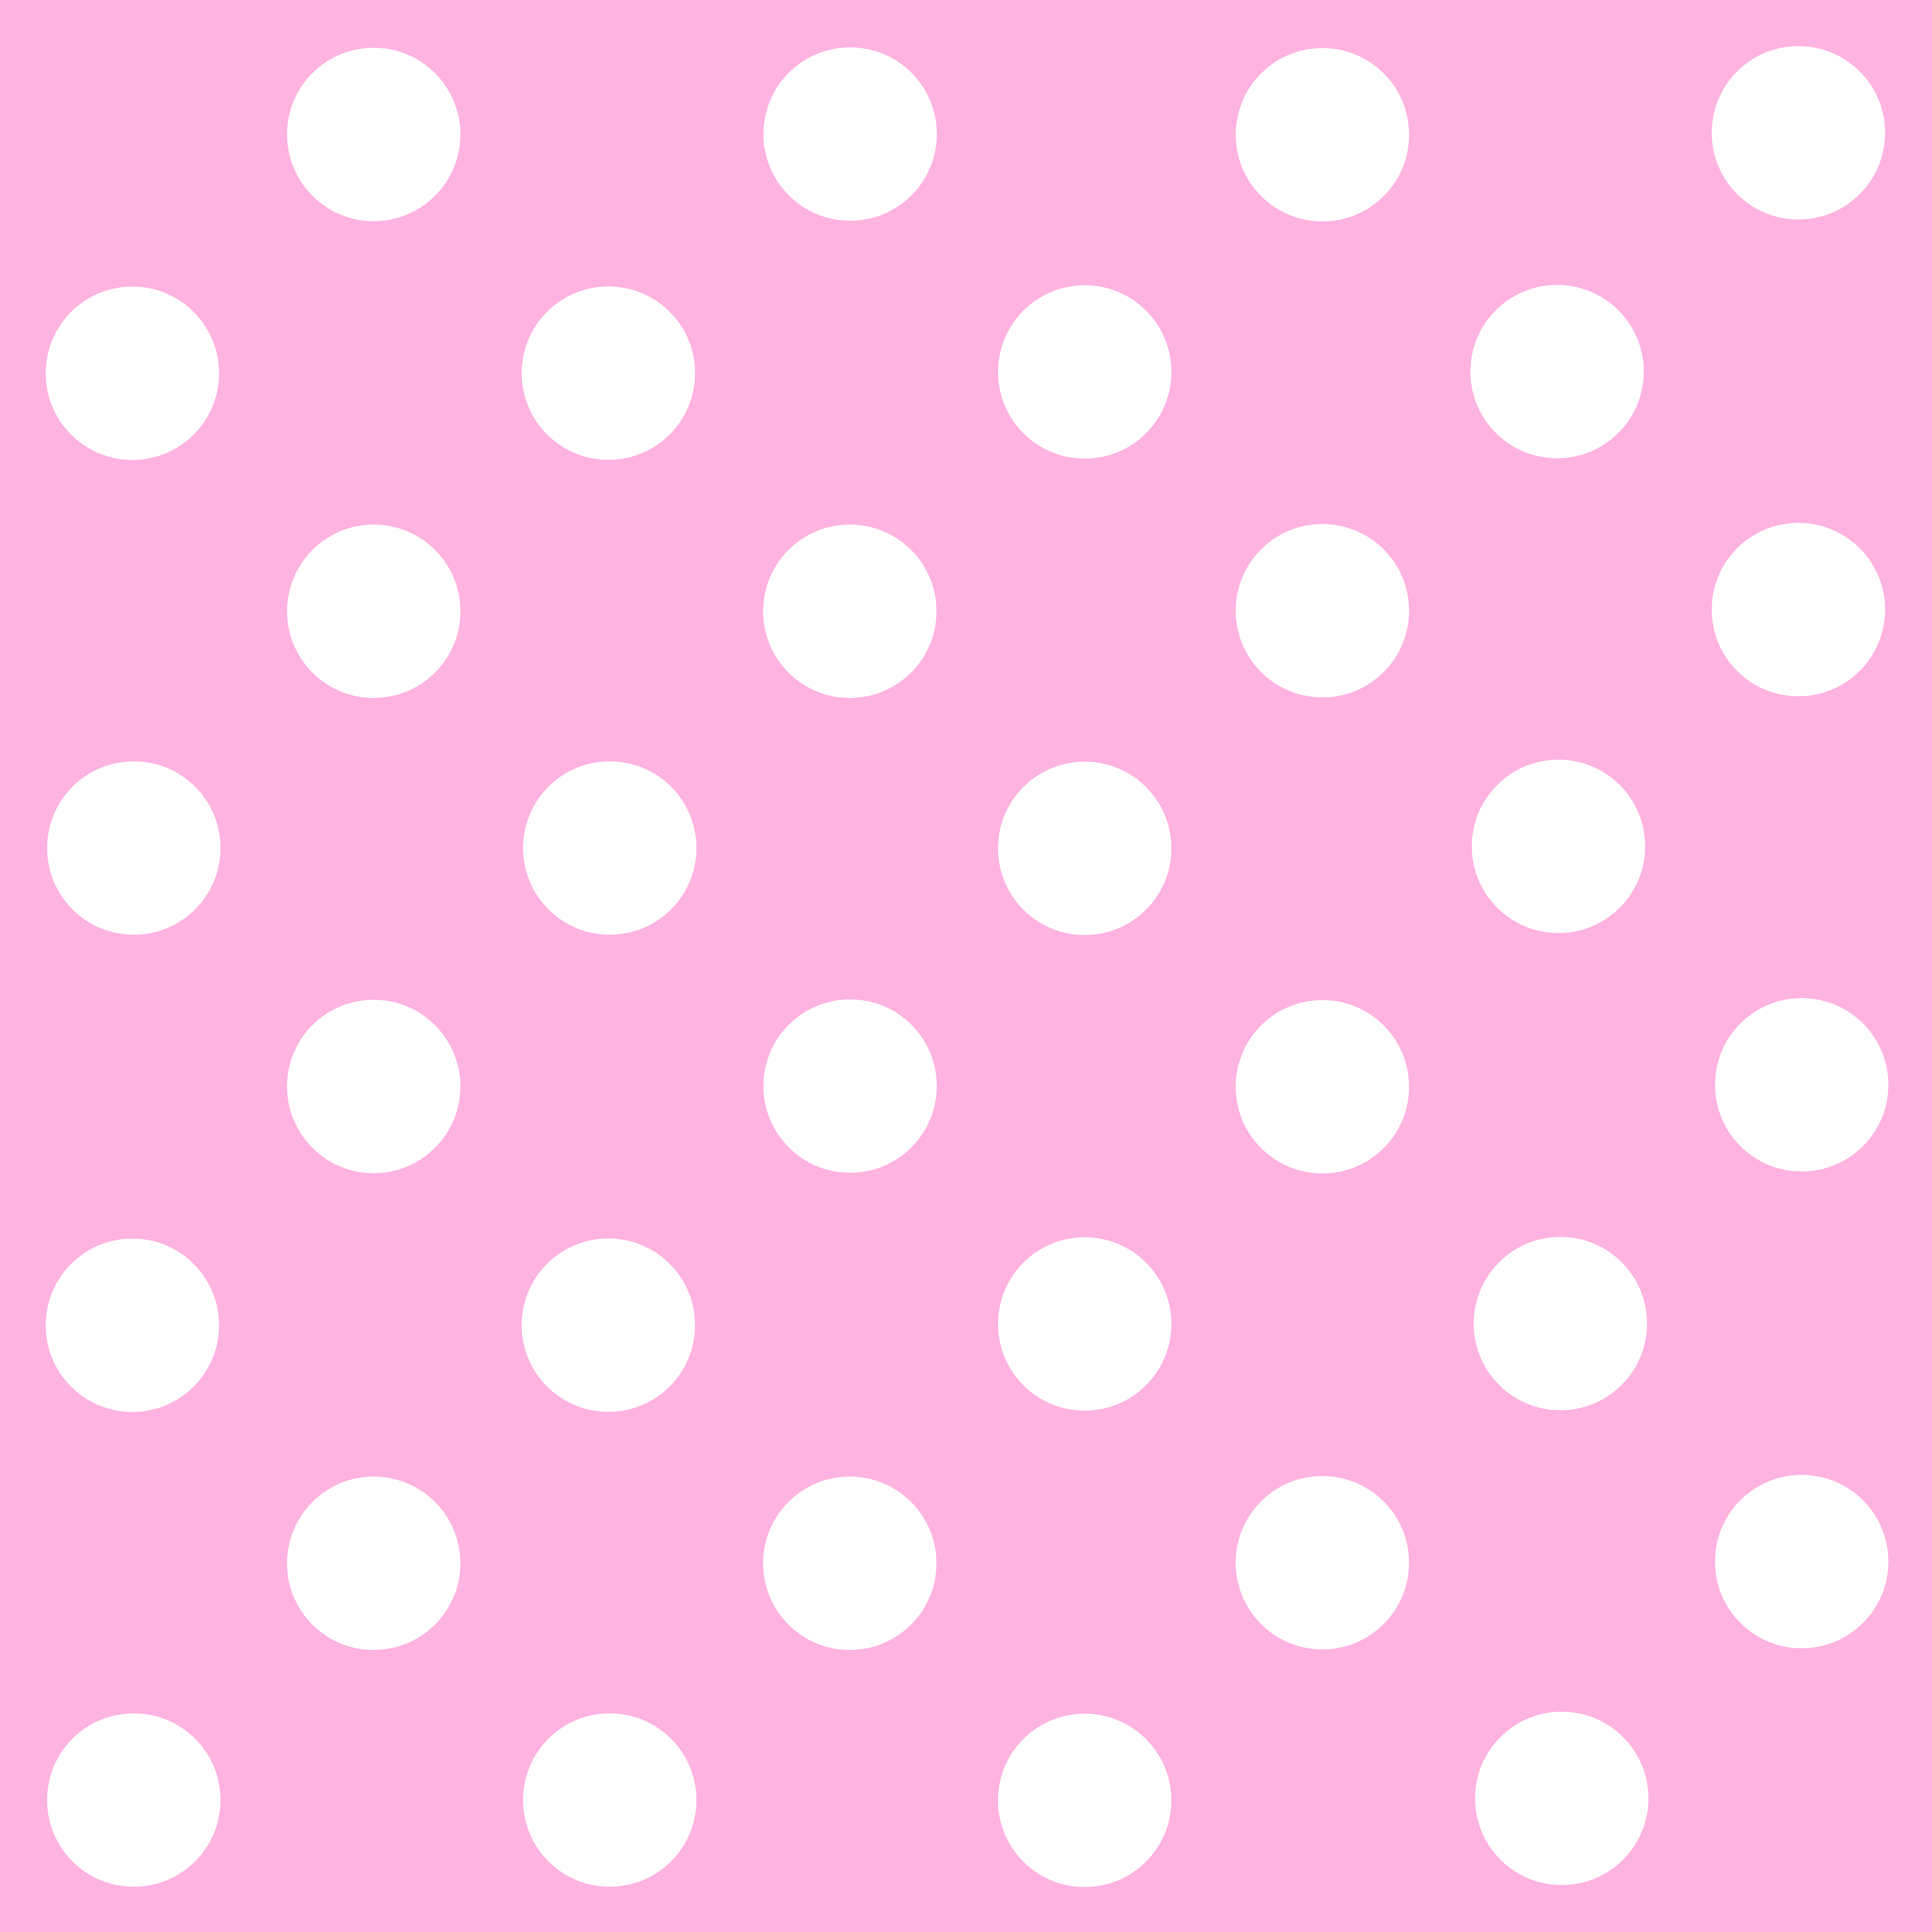 Wallpaper clipart pink Brick Dot Wallpaper White 2016